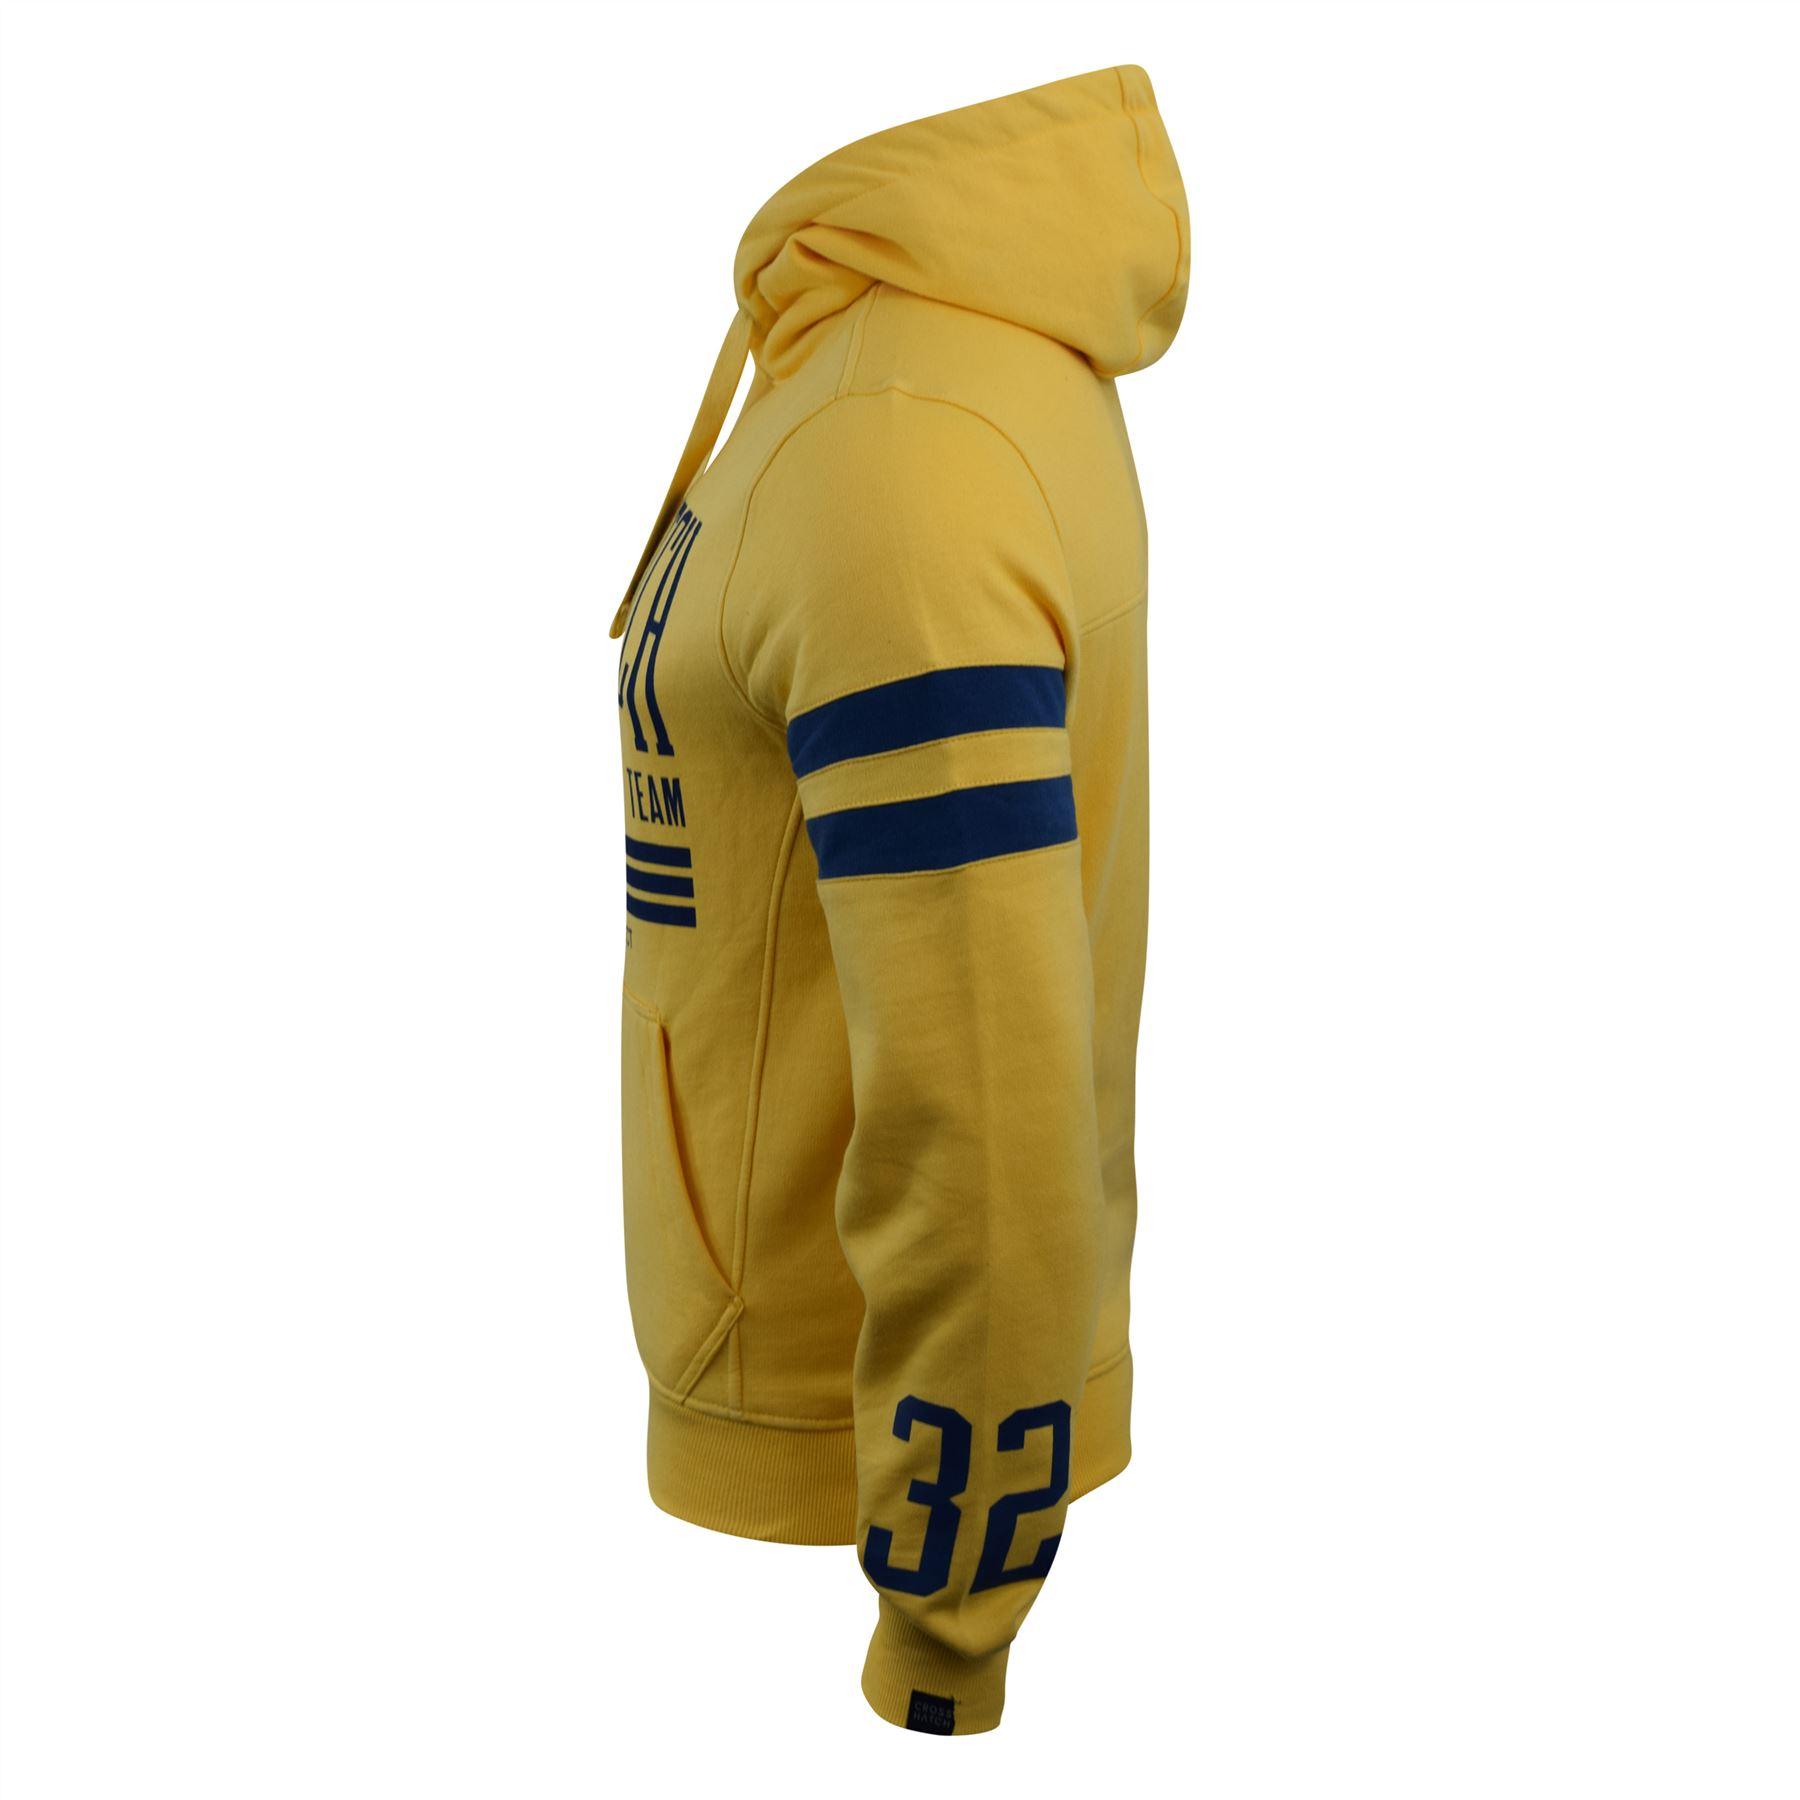 Mens-Hoodie-Crosshatch-Clothing-Sweatshirt-Hooded-Jumper-Top-Pullover-Cramform thumbnail 9